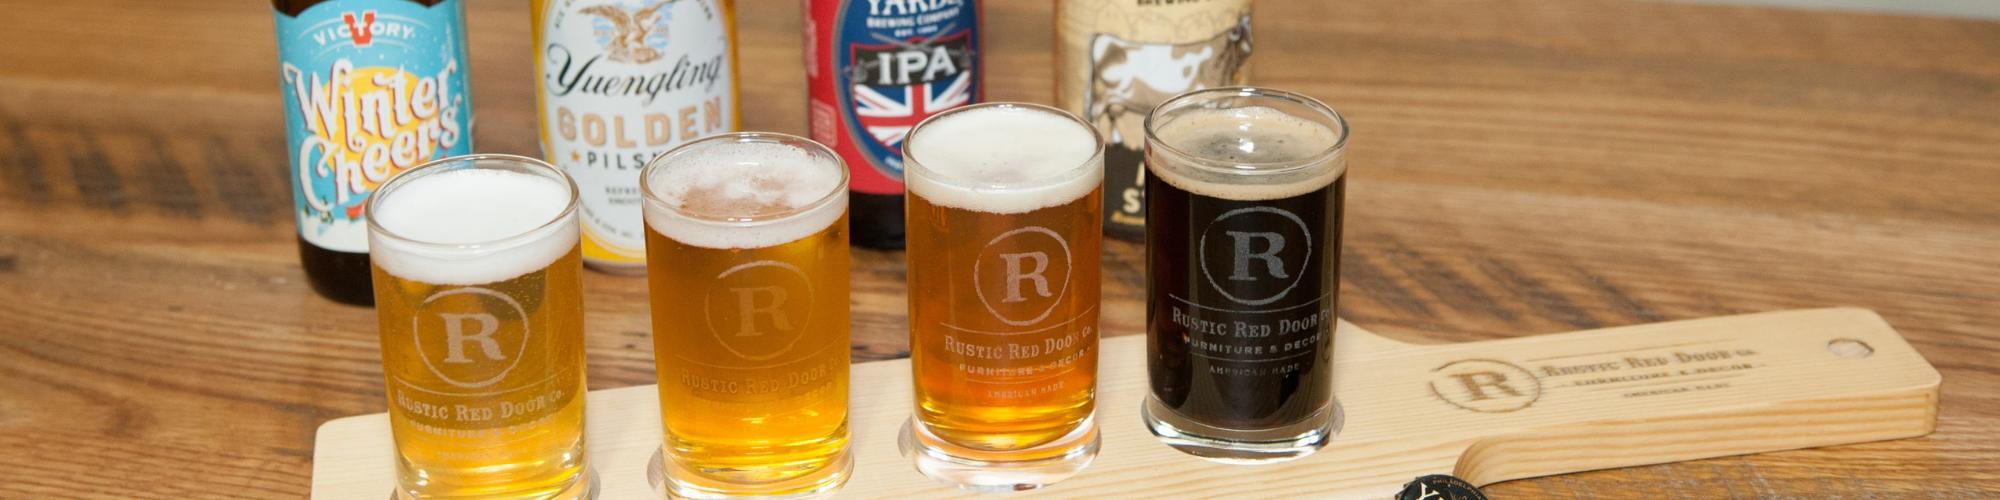 At-Home Beer Tasting Made Simple